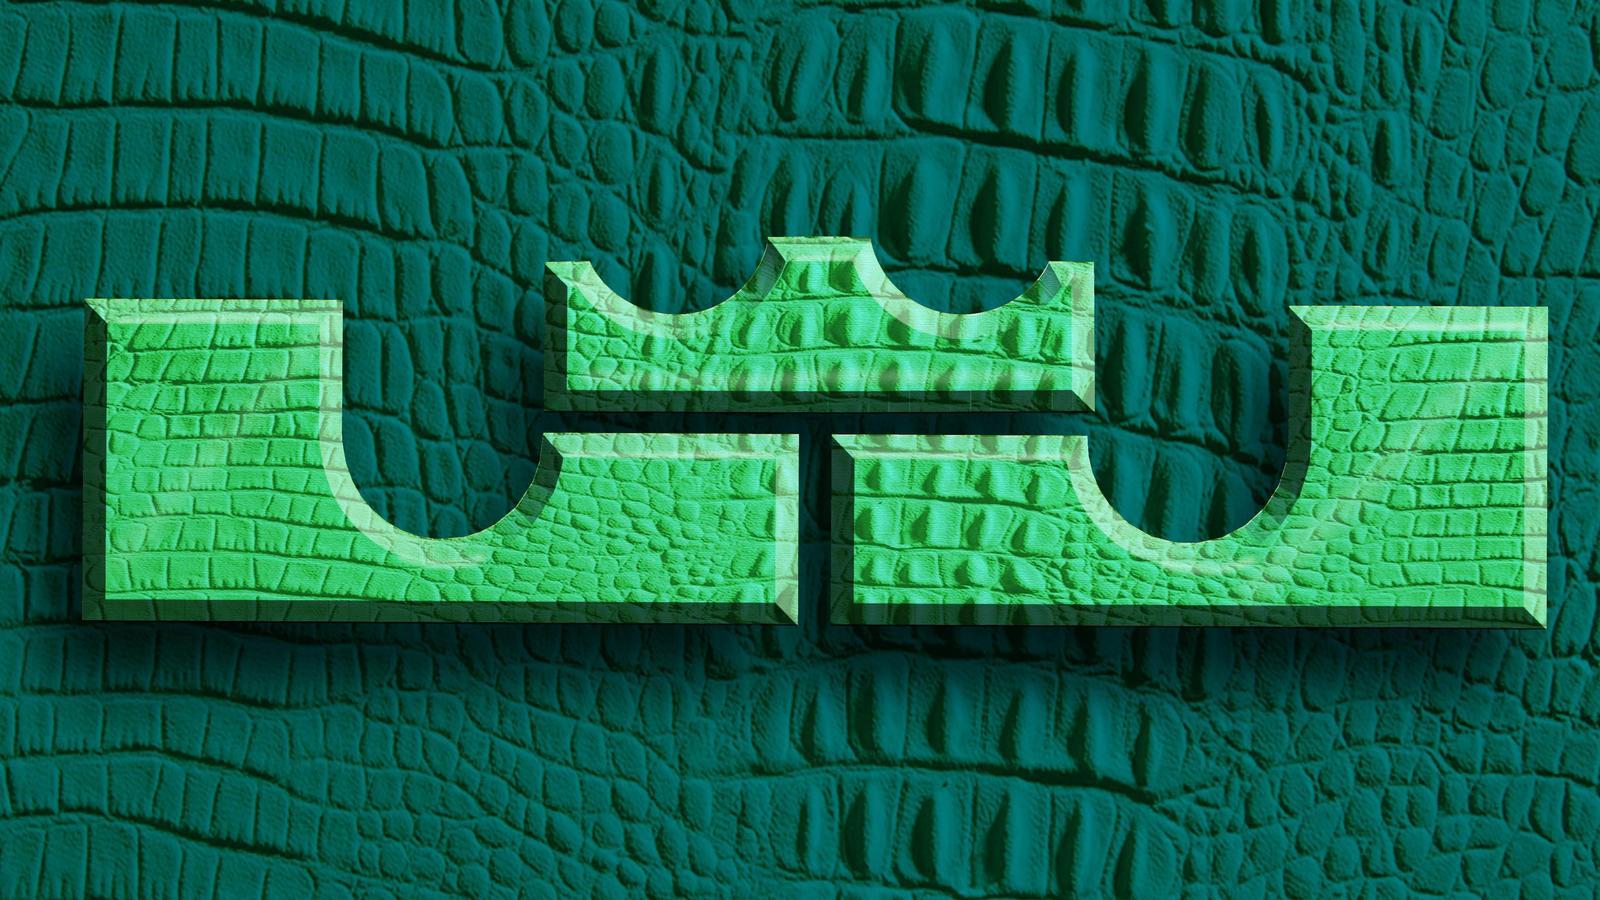 Lebron James Shoes Logos